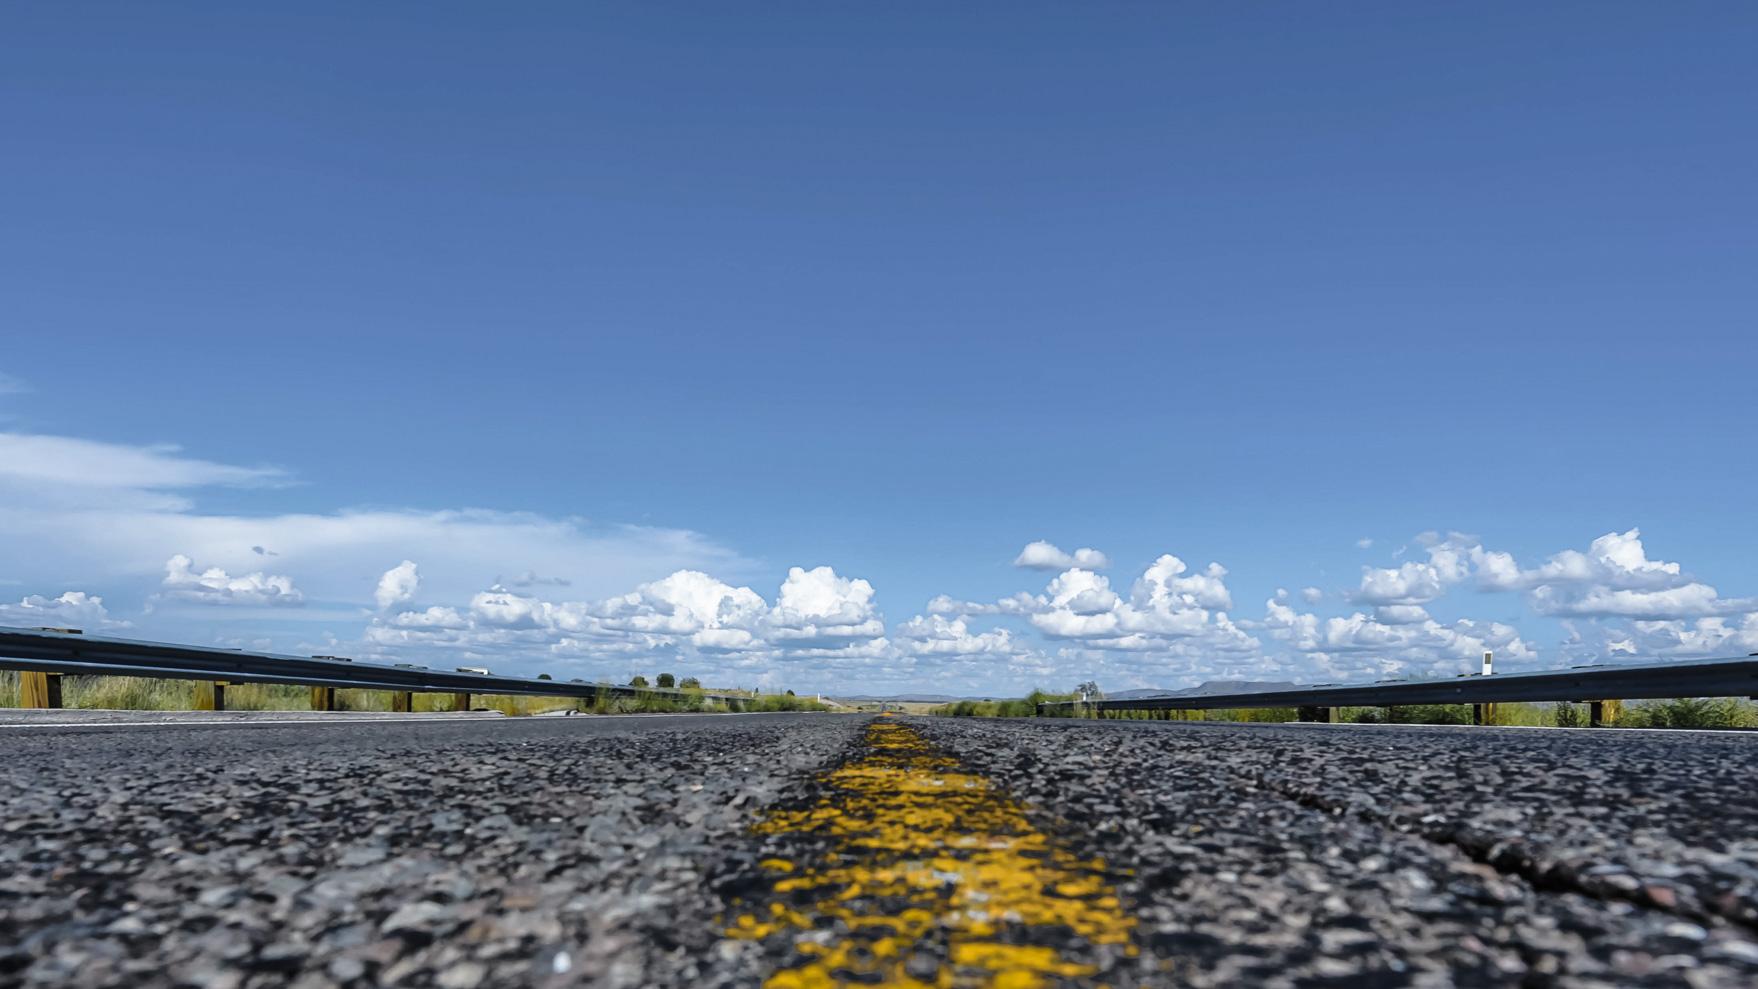 road-66-arizona.jpg